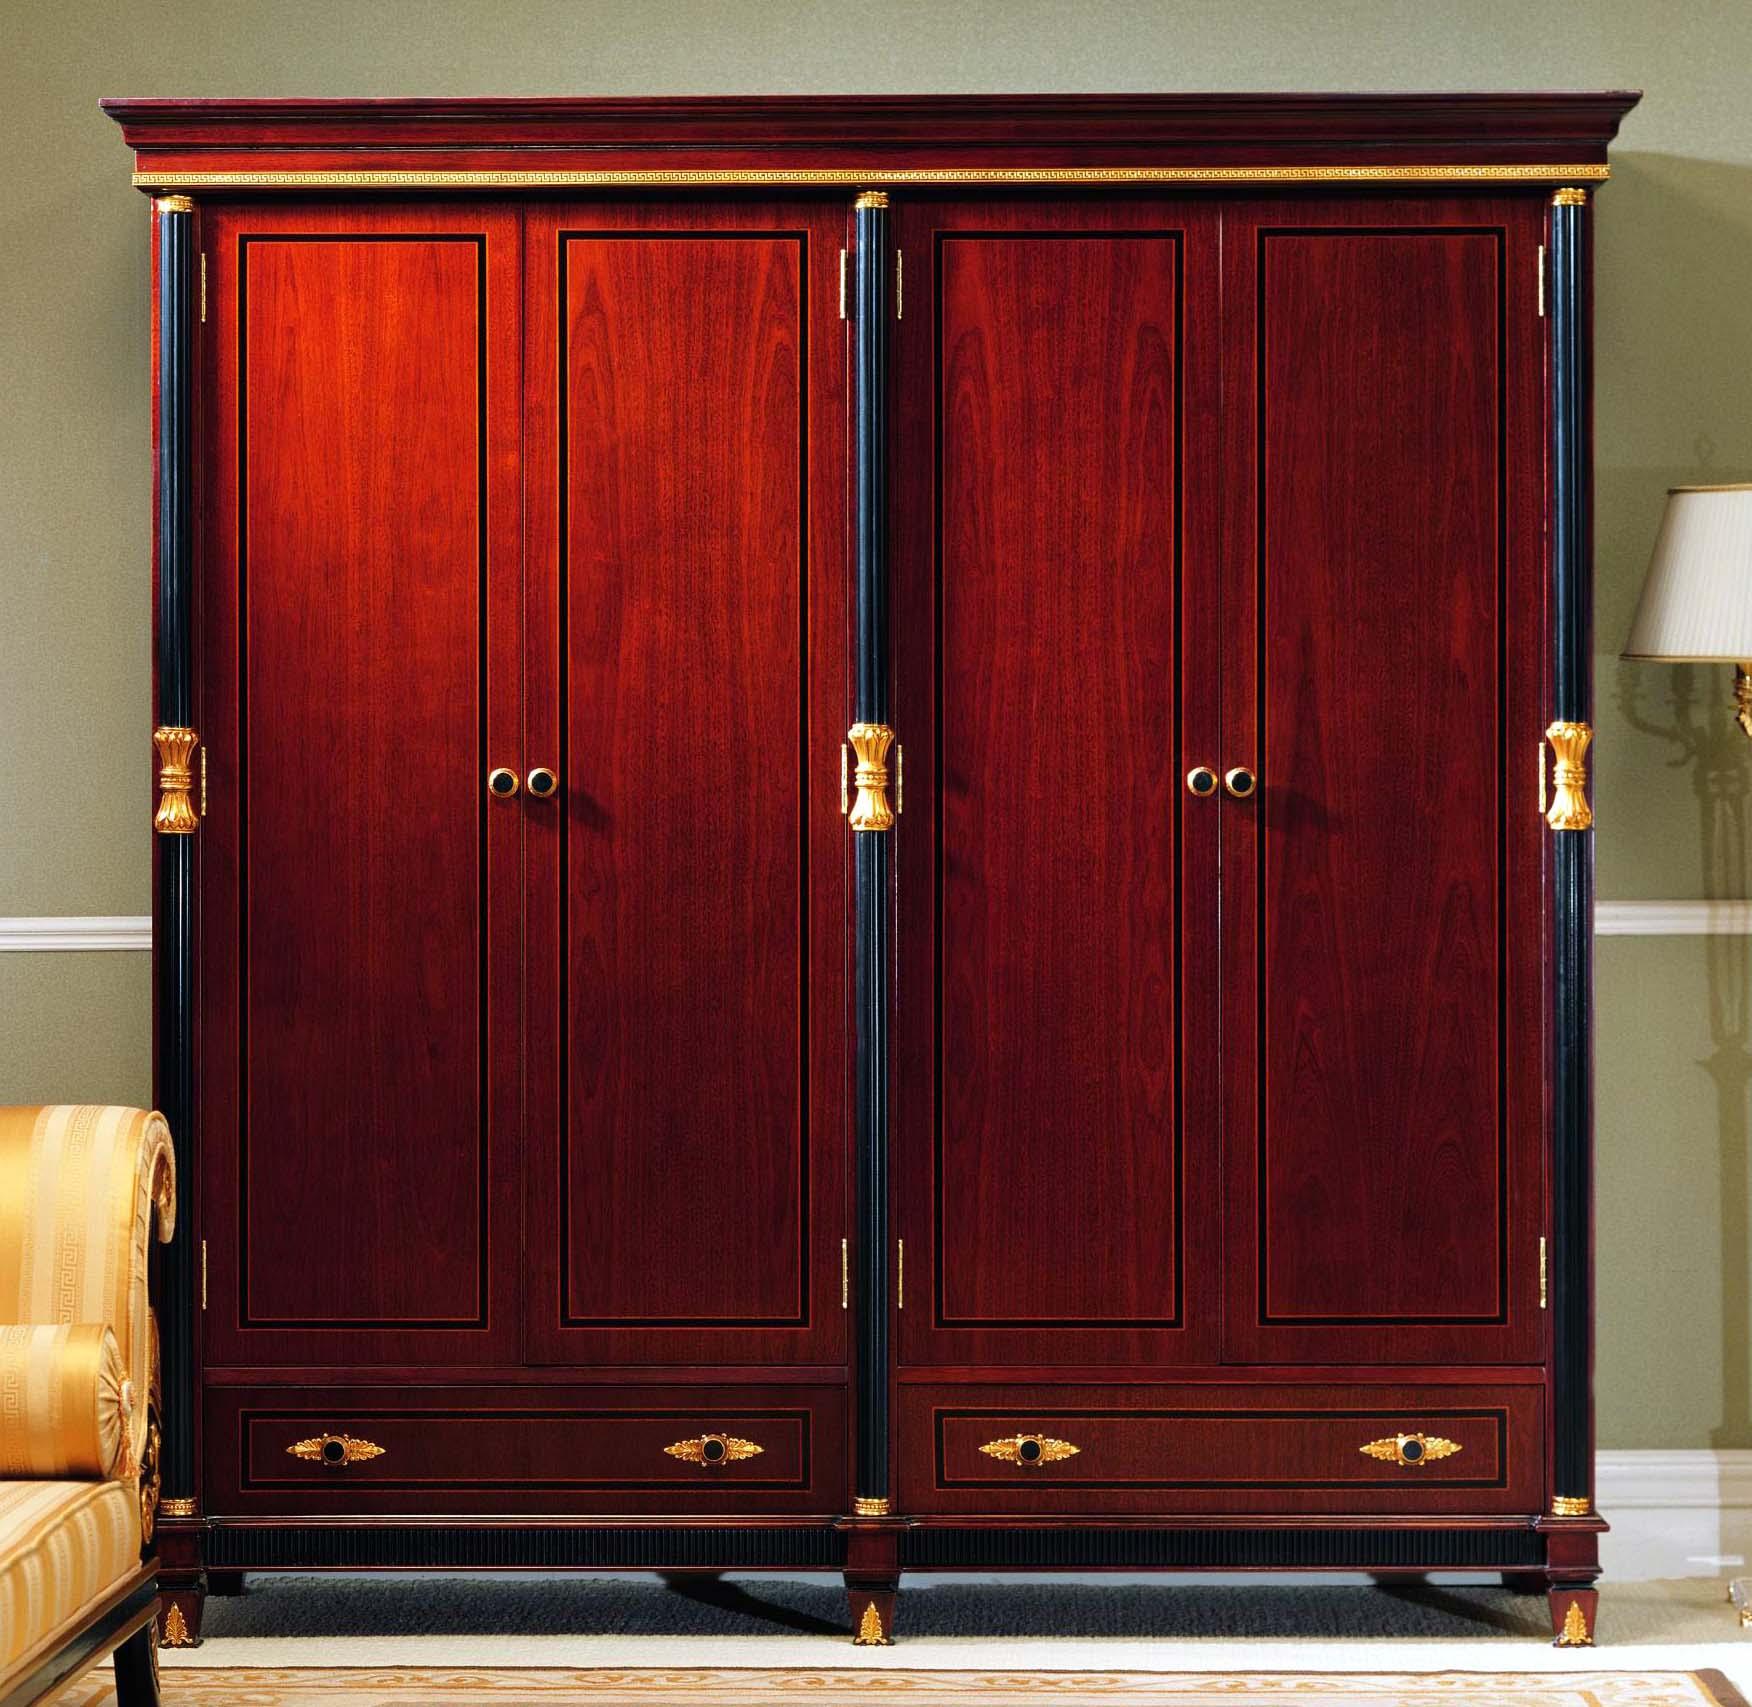 Beautiful Wardrobe Closet: Wardrobe Closet Jewelry Armoire wardrobe closet armoire